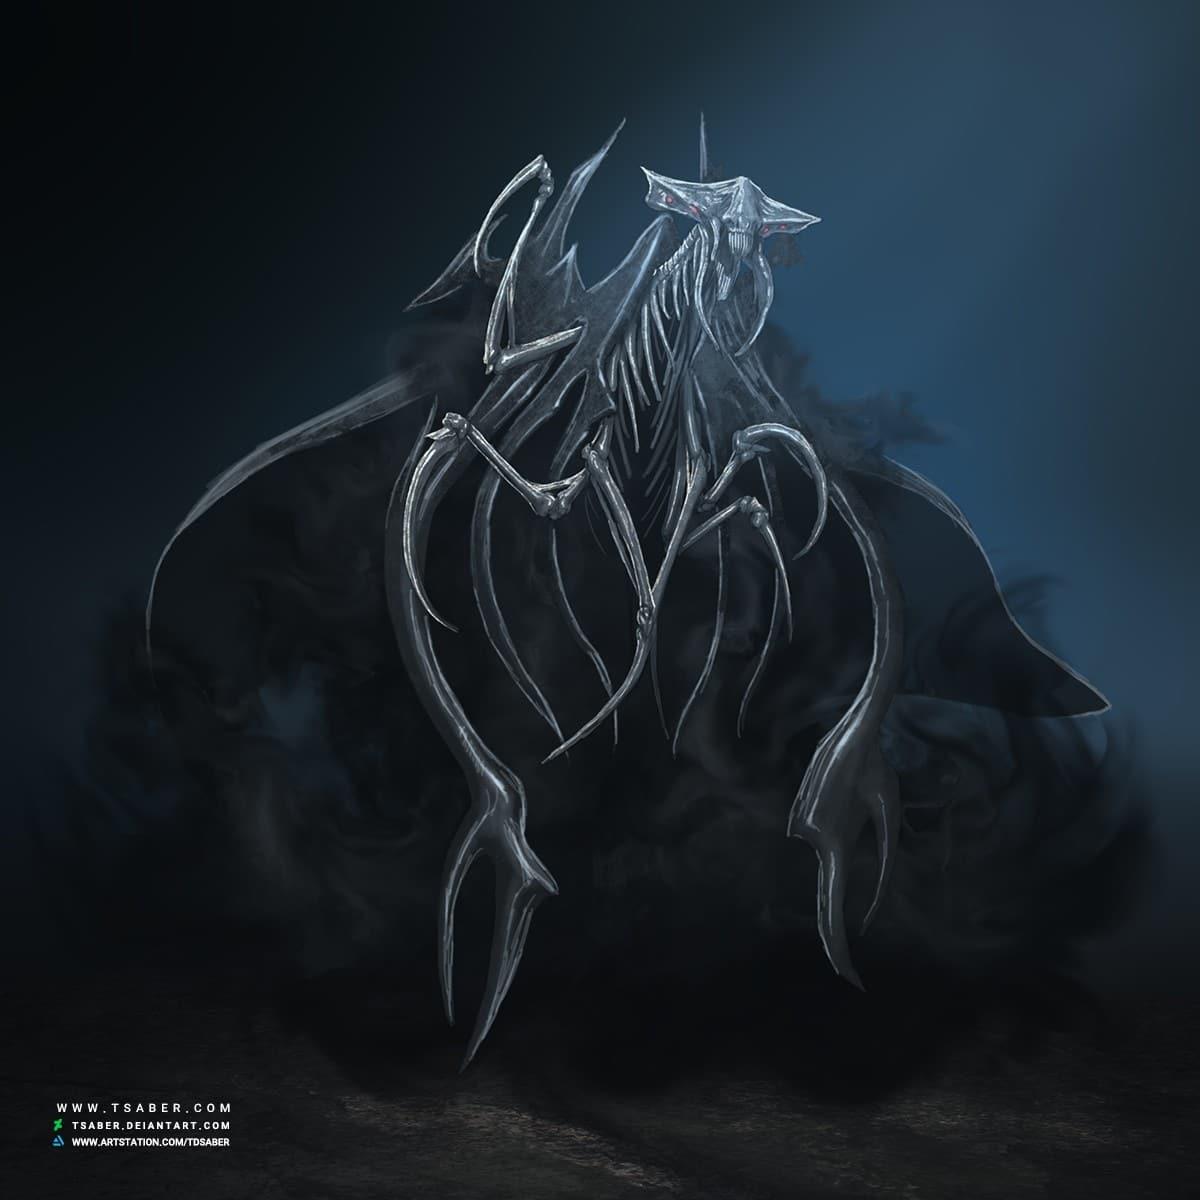 beneath-the-waves-death-tsaber